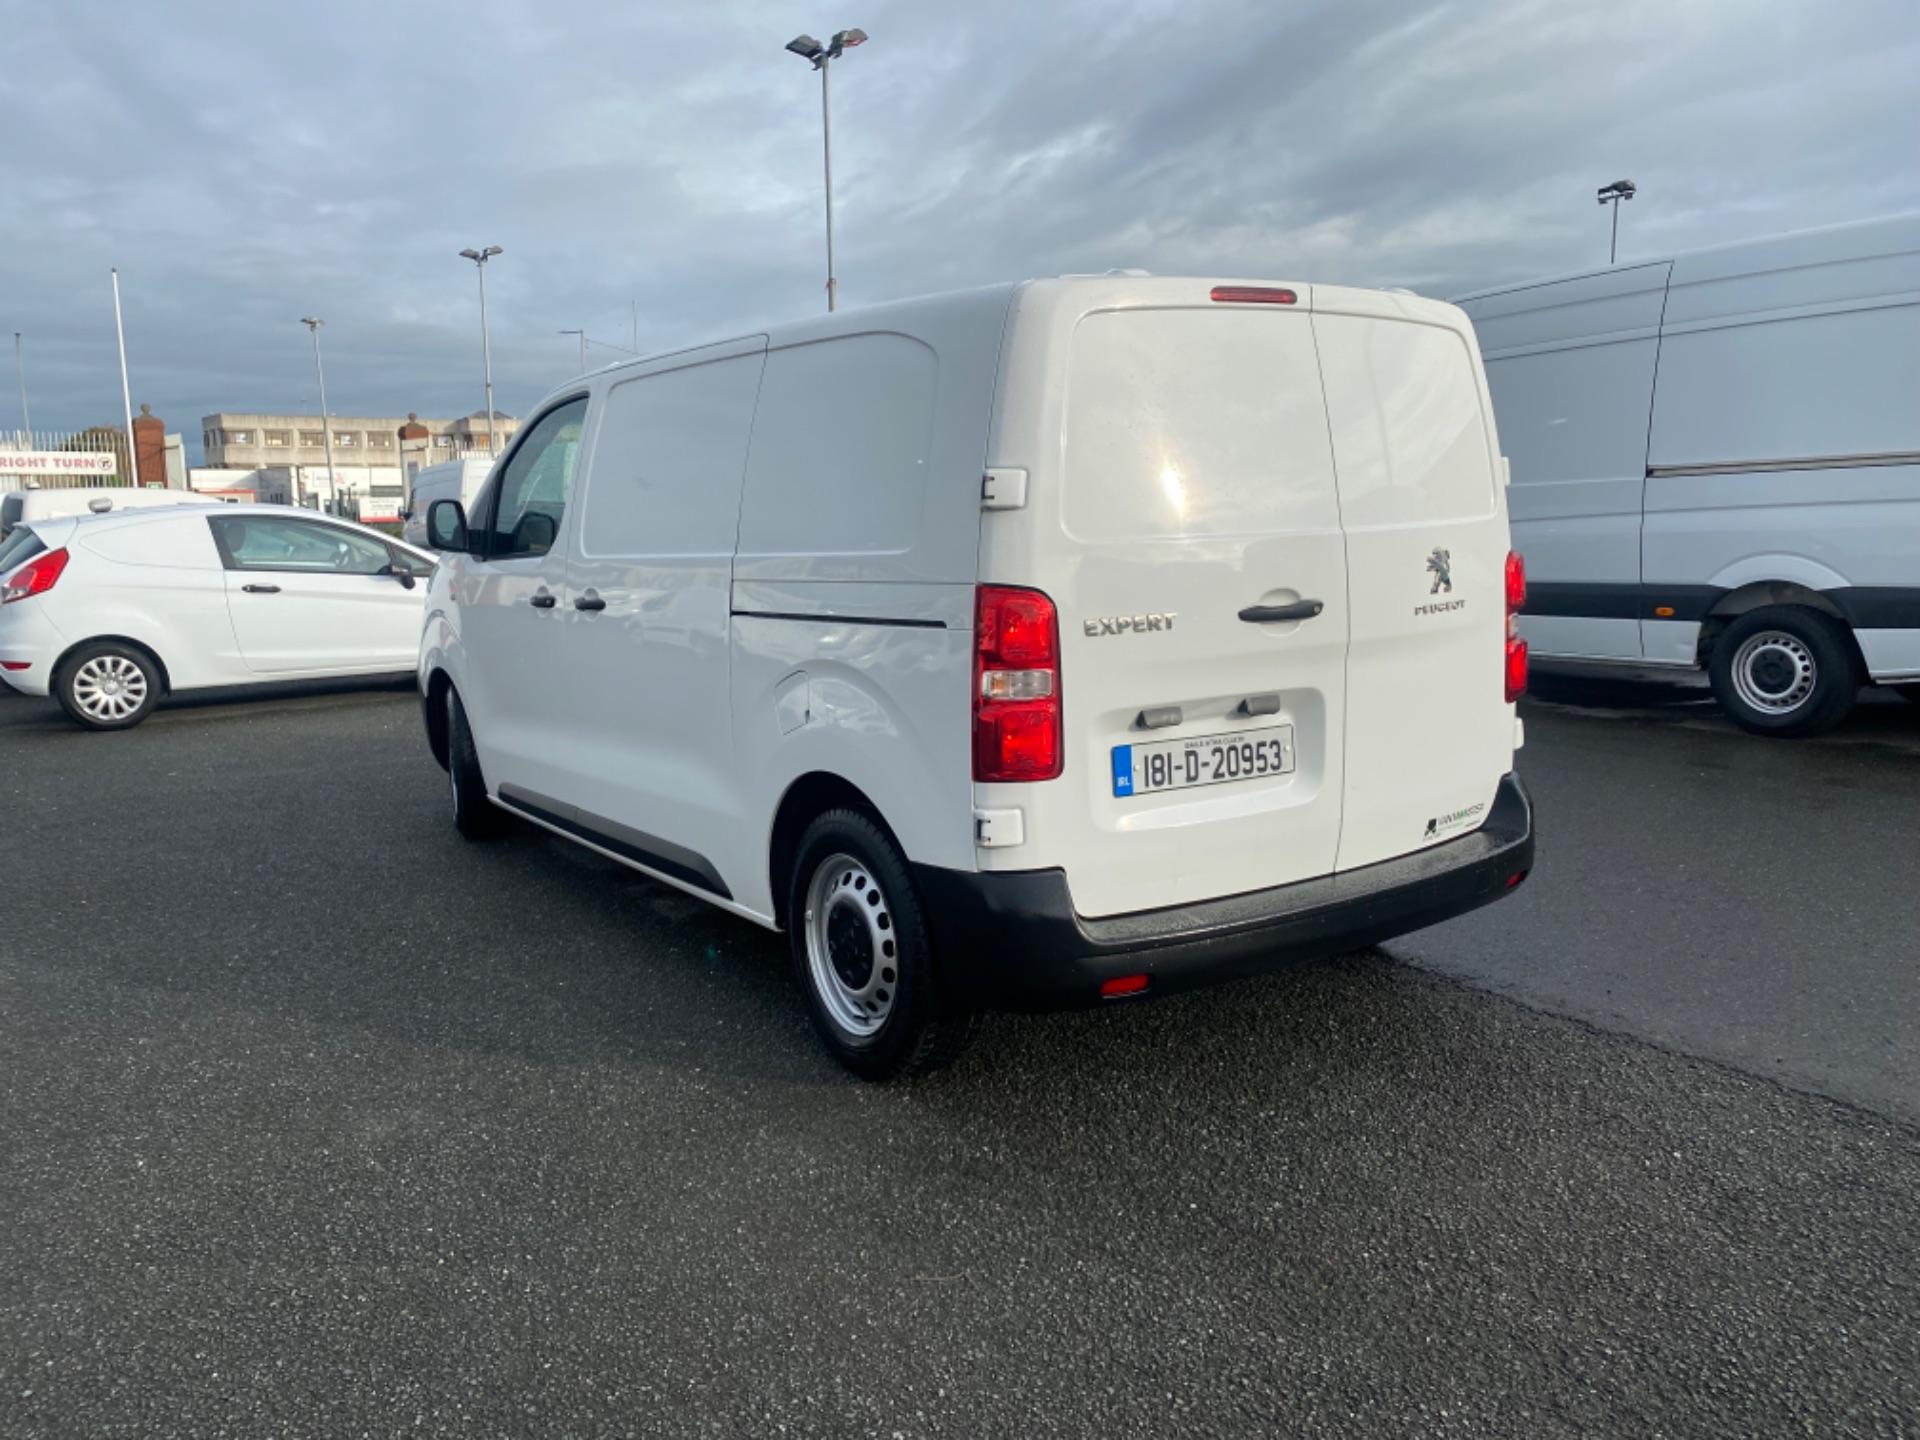 2018 Peugeot Expert Active Standard 1.6 Blue HDI 9 (181D20953) Image 4